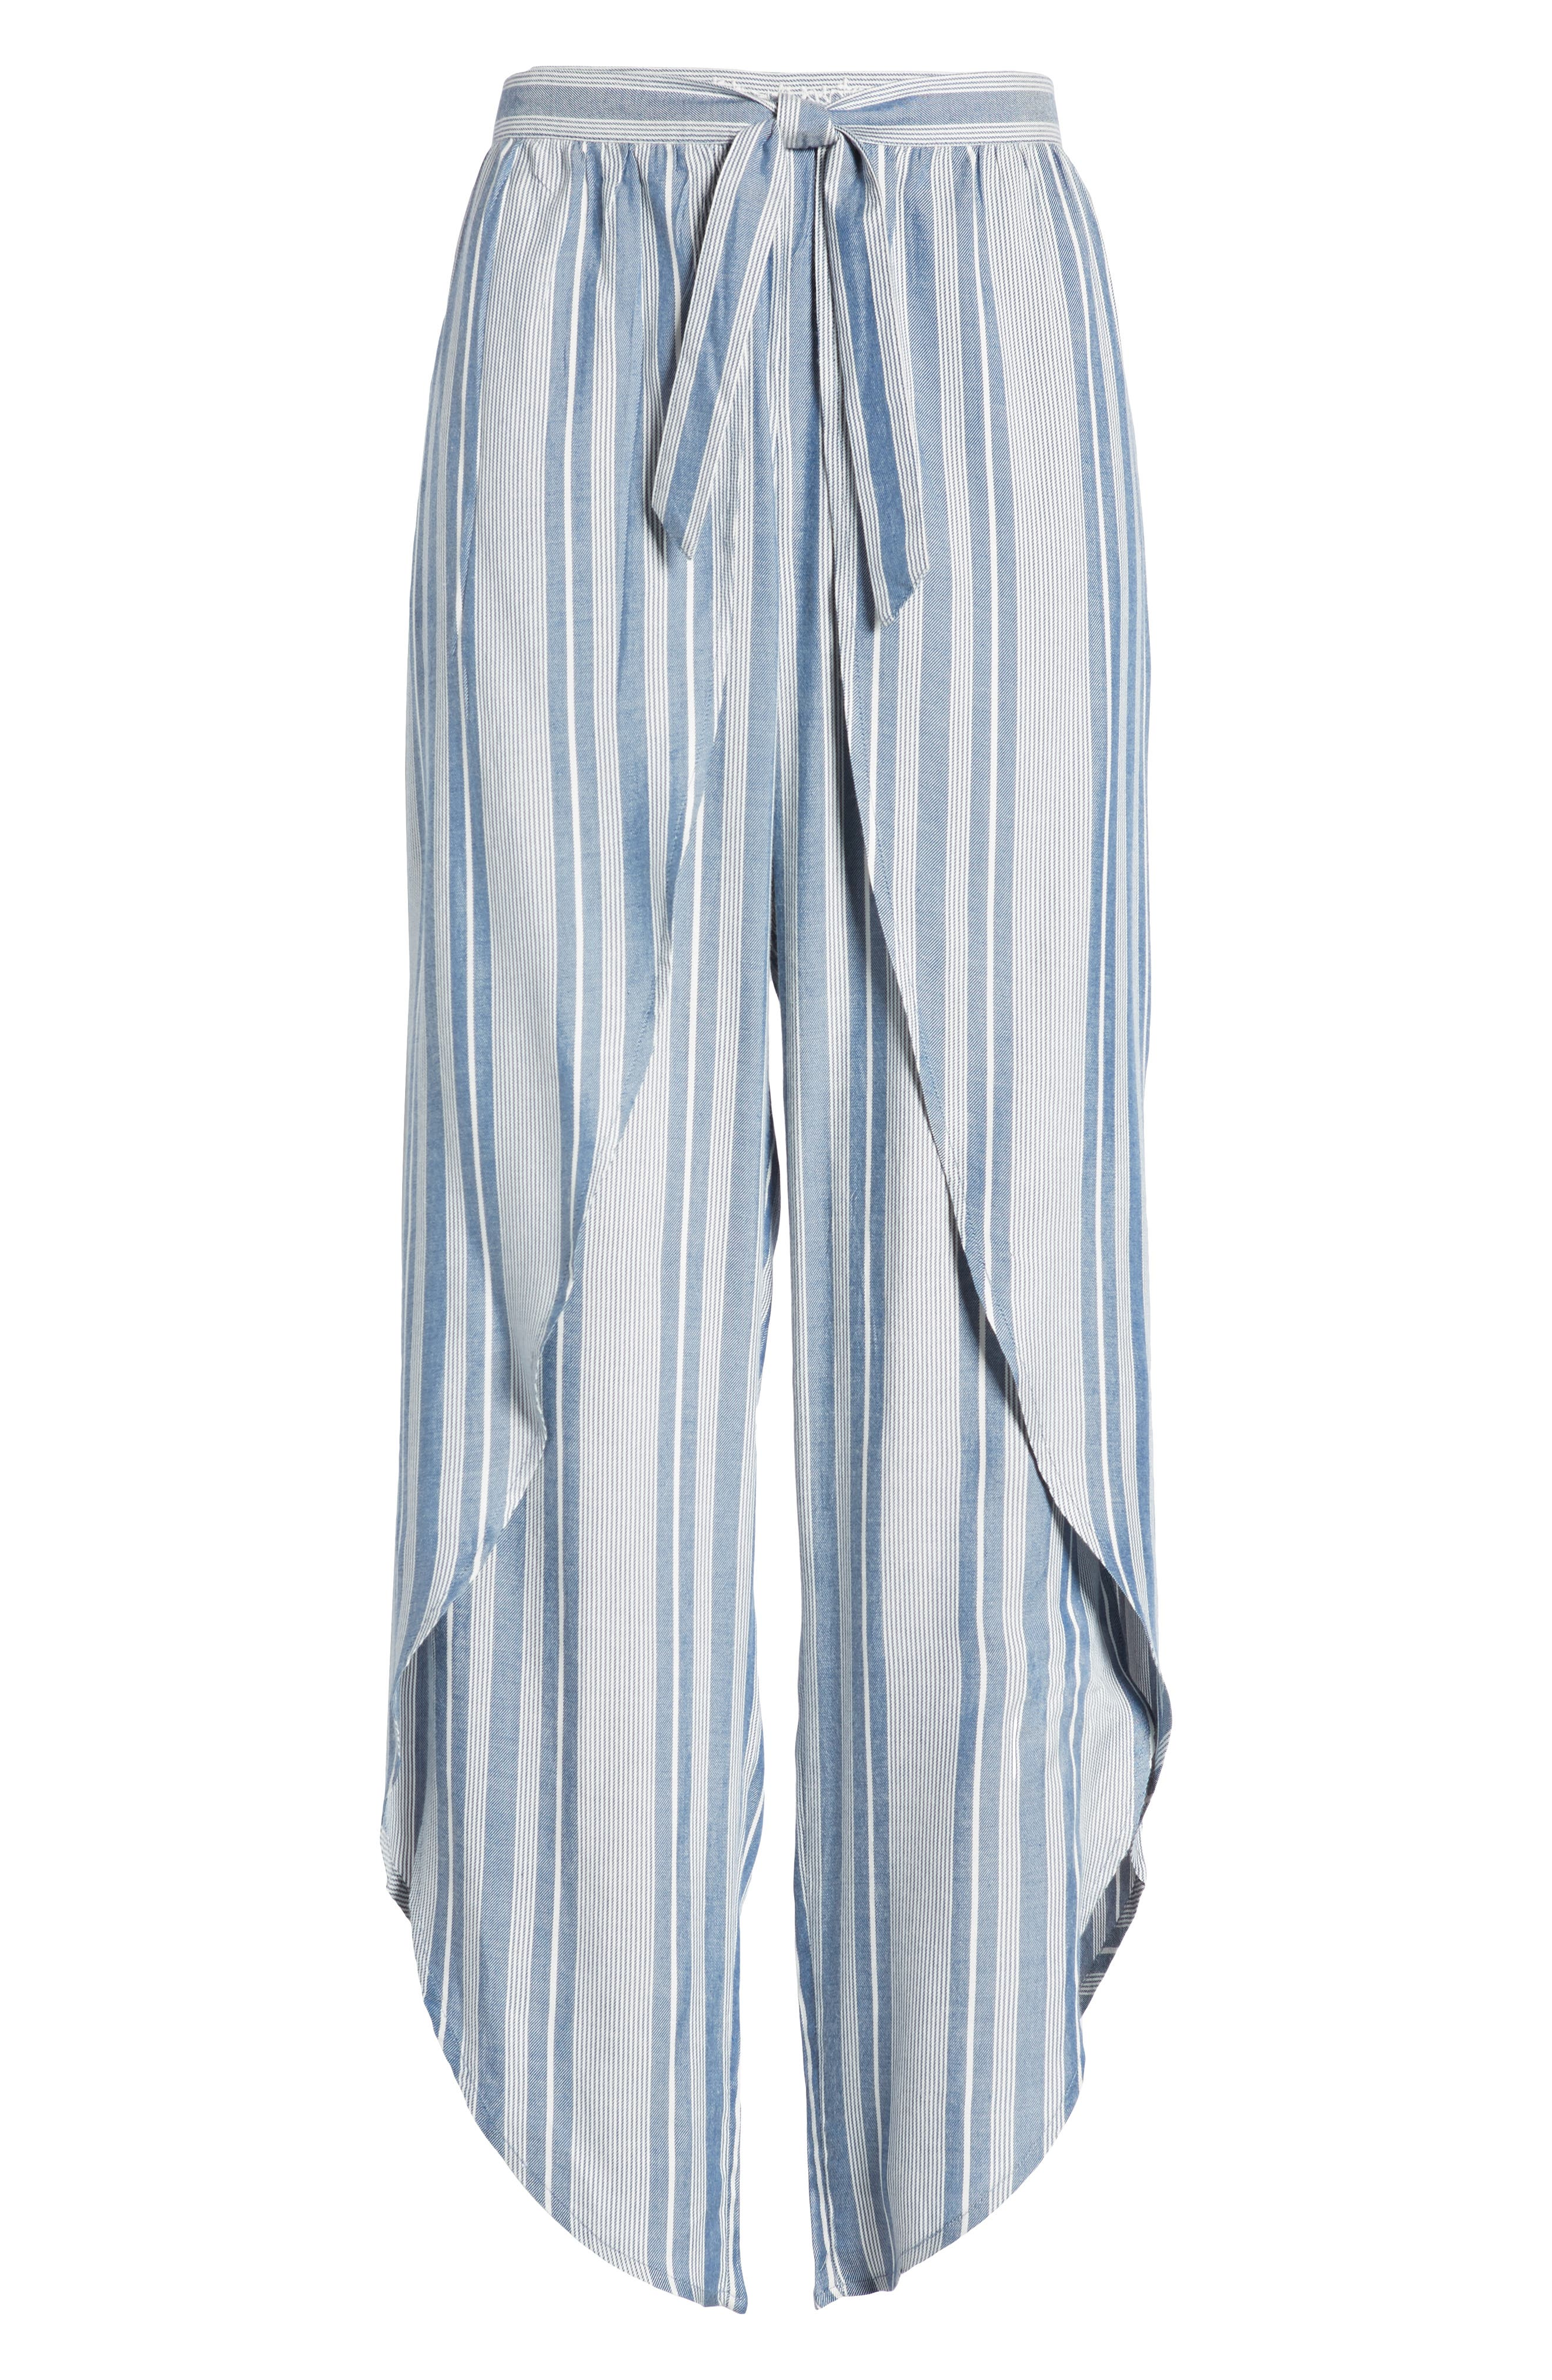 Jessa Stripe Tulip Hem Pants,                             Alternate thumbnail 7, color,                             MARSHMALLOW EMBROIDERED FLORAL